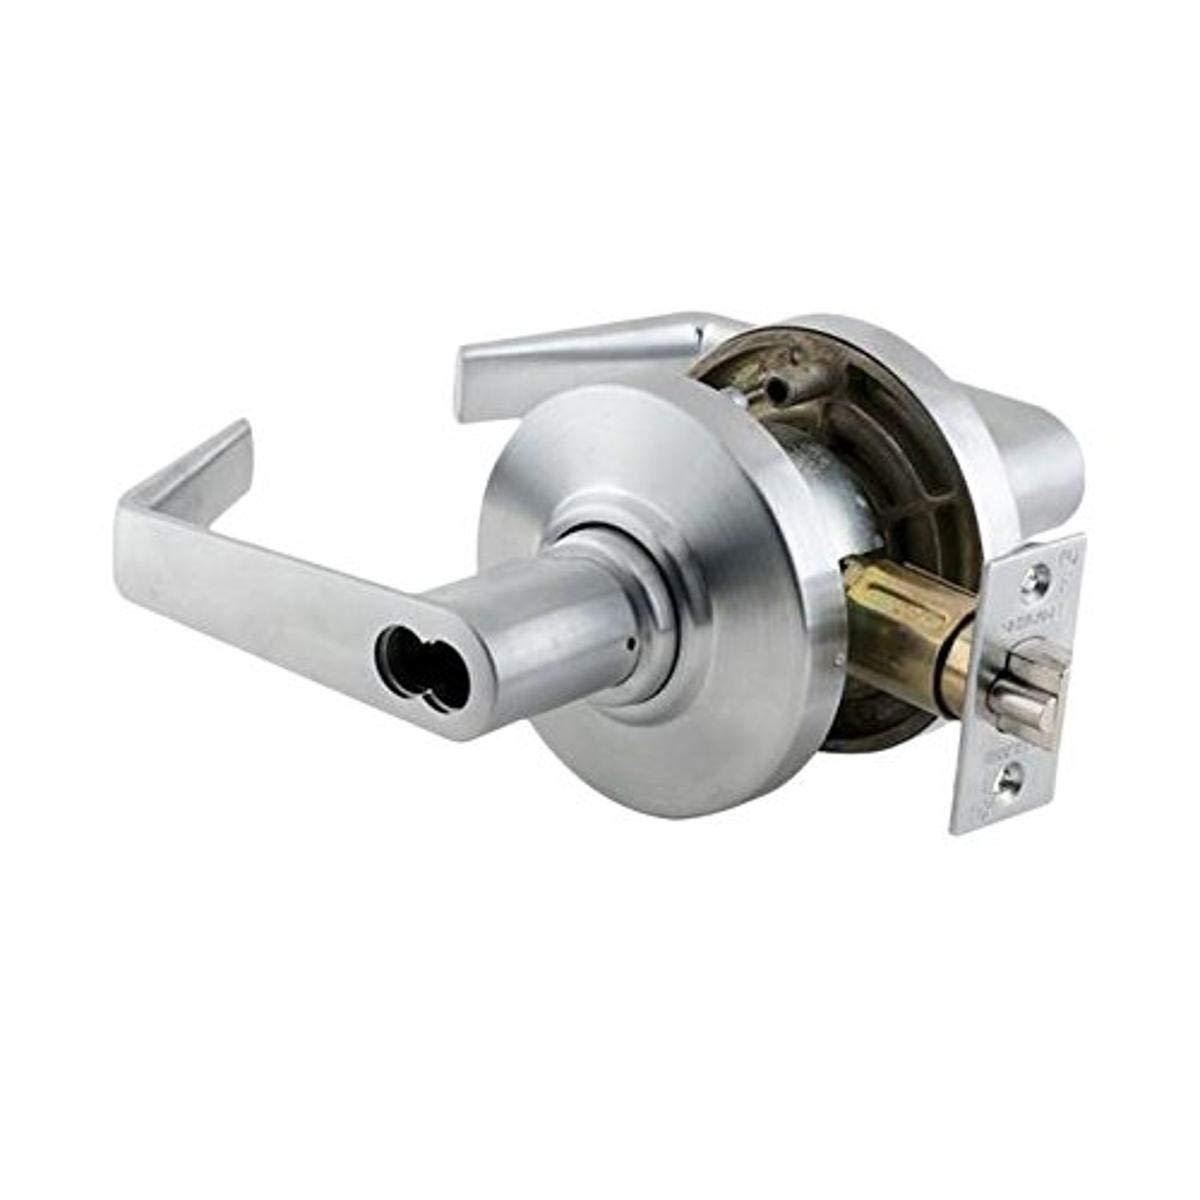 Schlage Commercial AL53JDSAT626 AL Series Grade 2 Cylindrical Lock, Entry Function Turn/Push Button Locking, Saturn Lever Design, Satin Chrome Finish